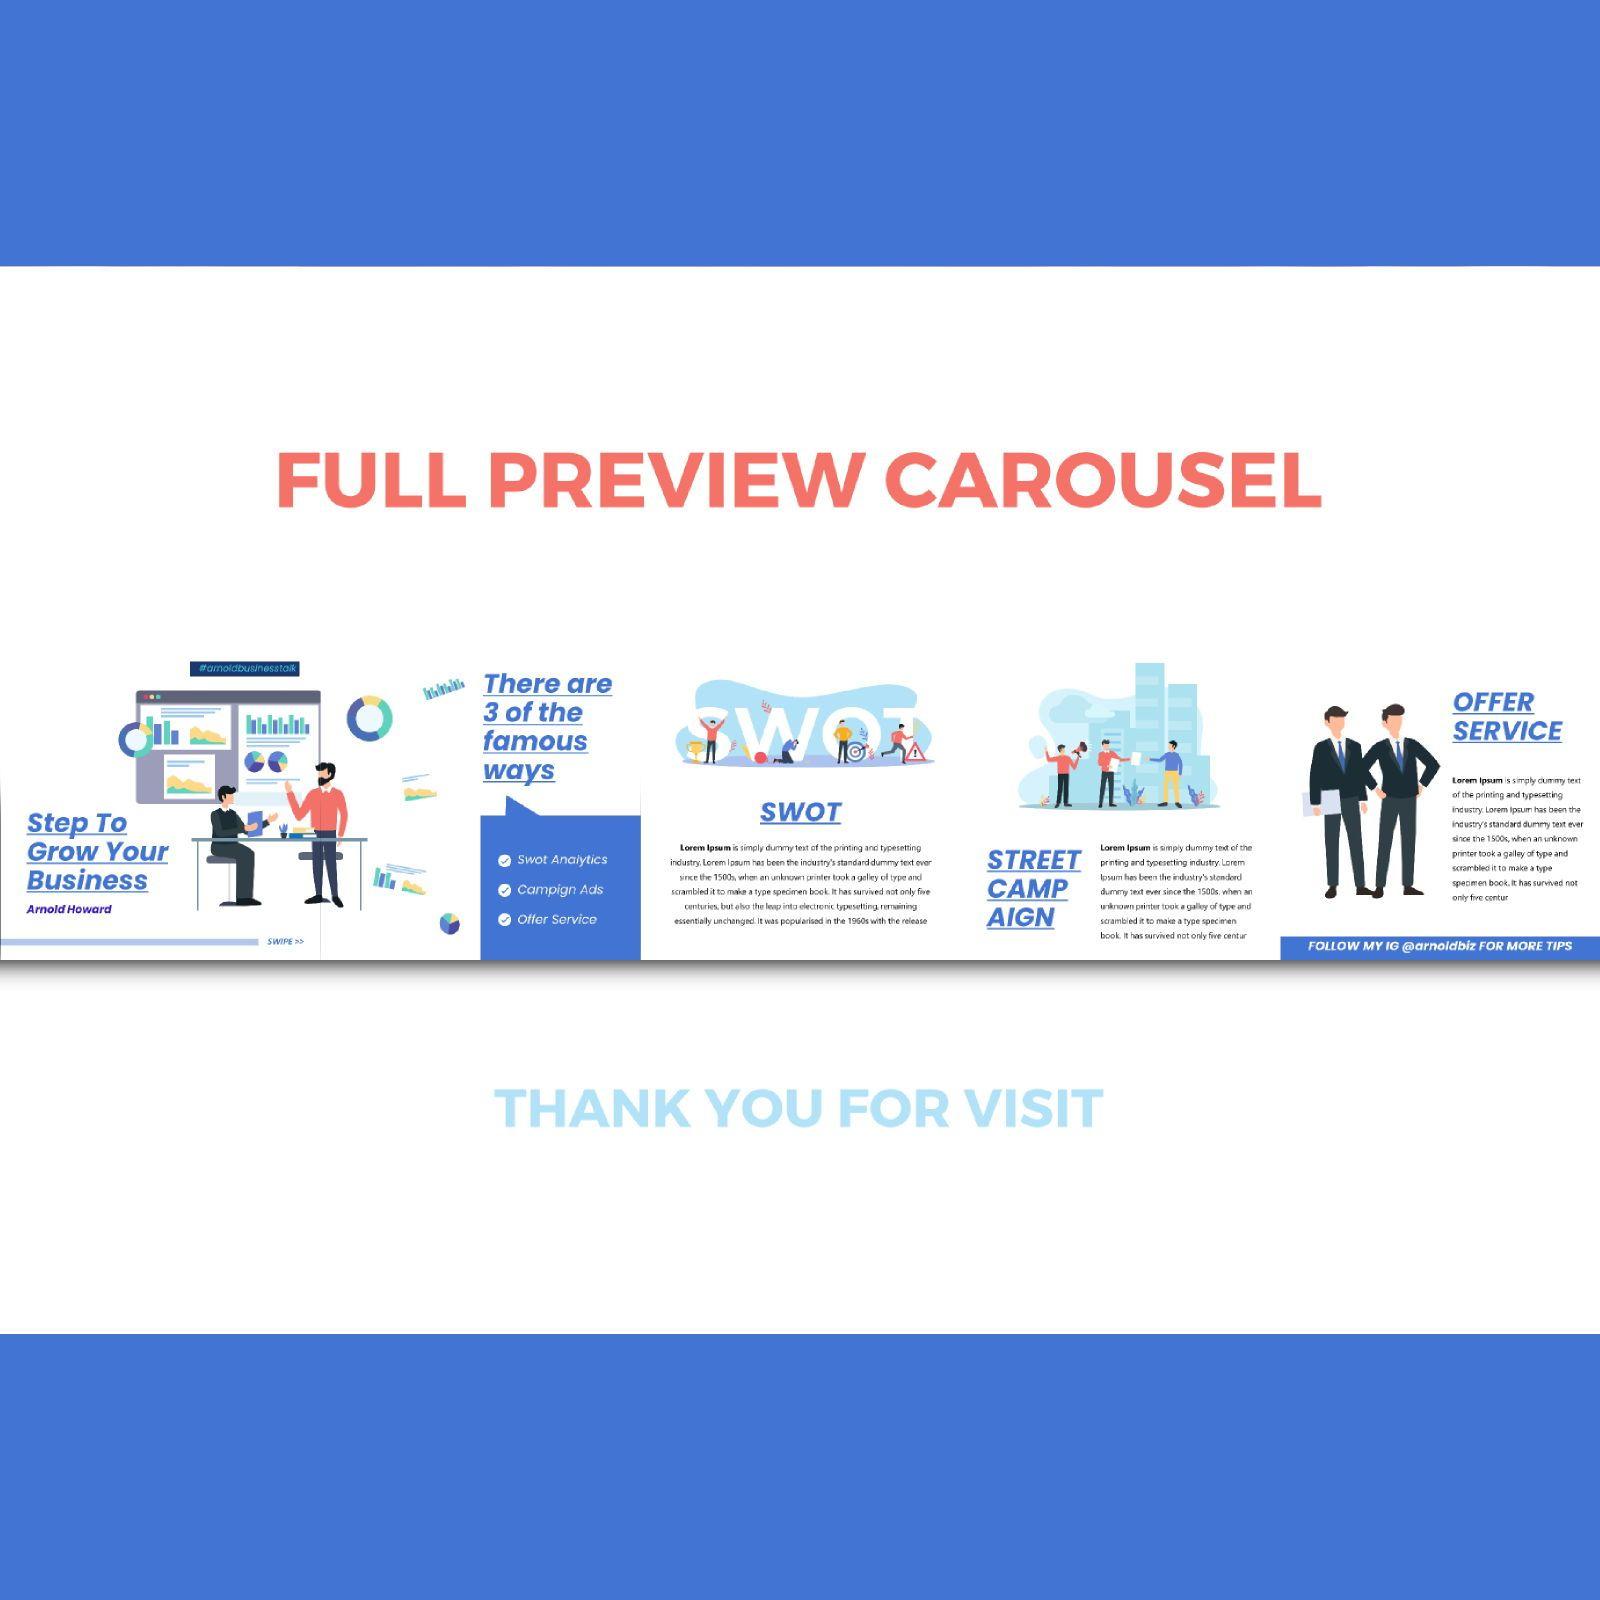 Business coaching instagram carousel powerpoint template, Slide 3, 07612, Business Models — PoweredTemplate.com